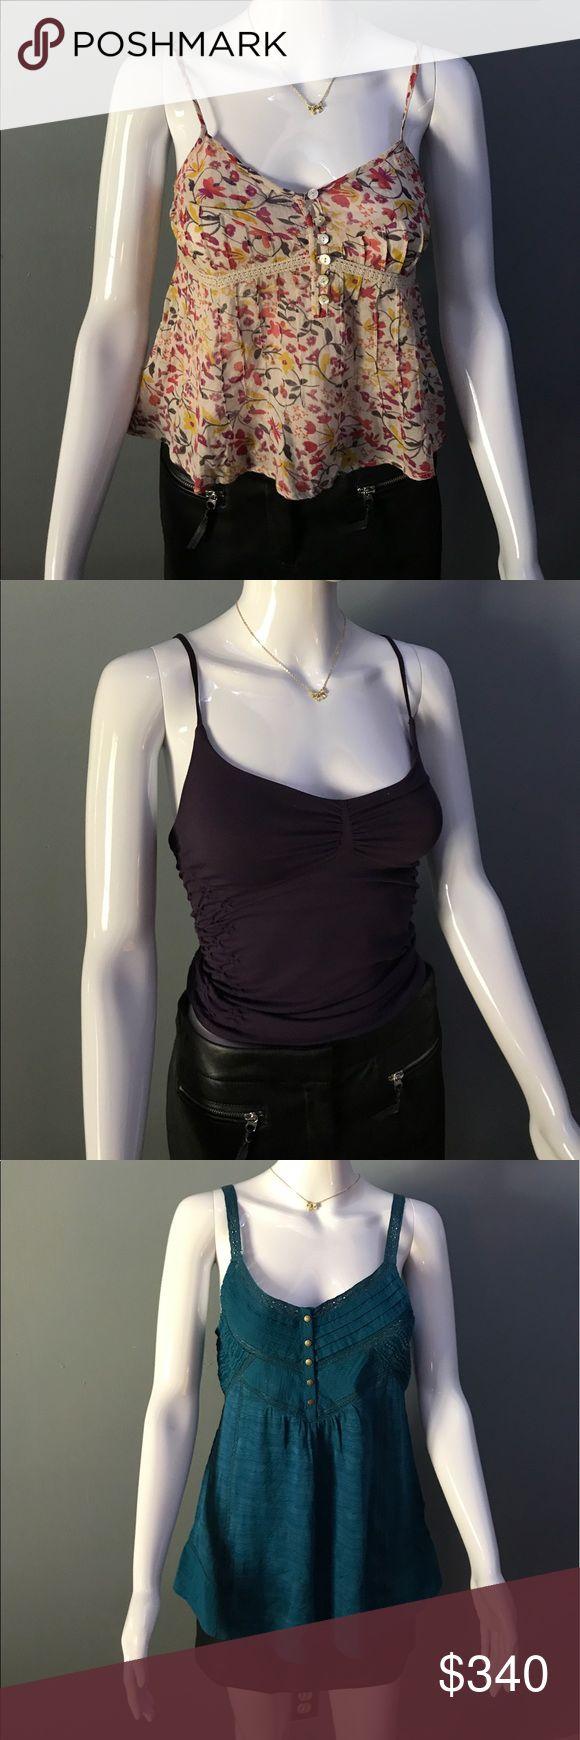 Vampire Diaries Wardrobe Department 1.Ecote $29. 2. Laundry Shelli Sagan $29 3. Lucky Brand $29. 4. Red Jacket $79. Diesel Jacket $100. 6. Black Jacket $75. 7. Joie Top $75. Lucky Brand Jackets & Coats